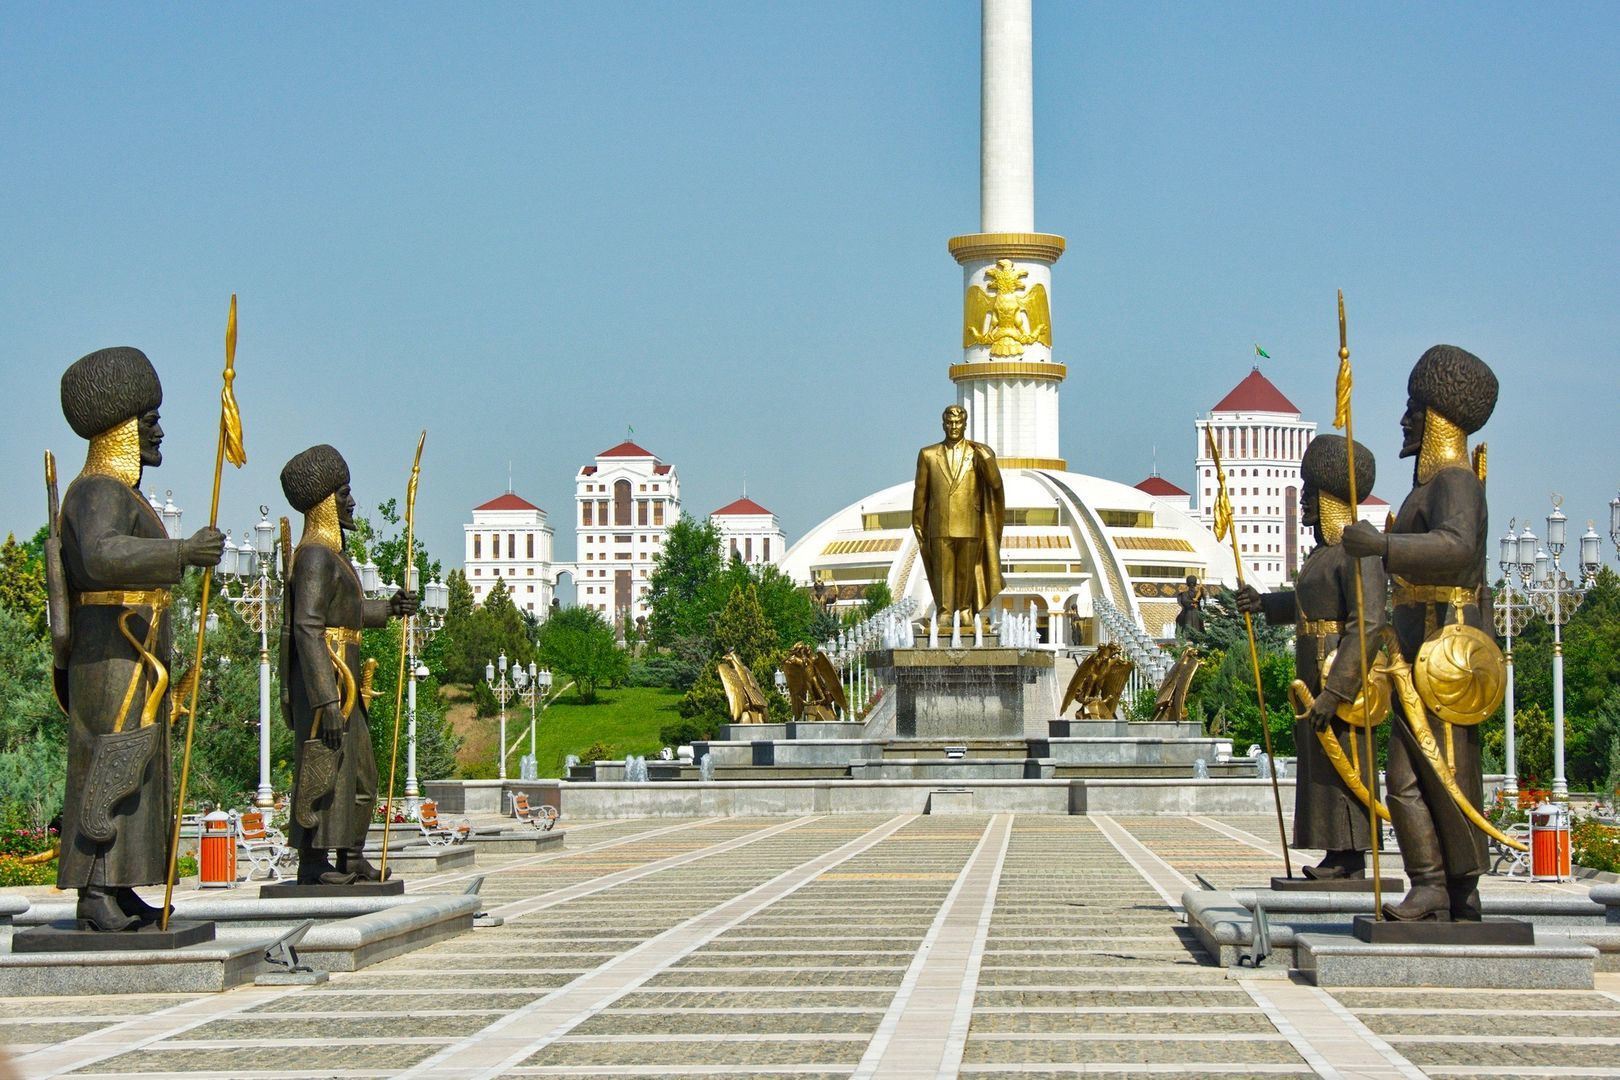 Ashgabat the capital of Turkmenistan